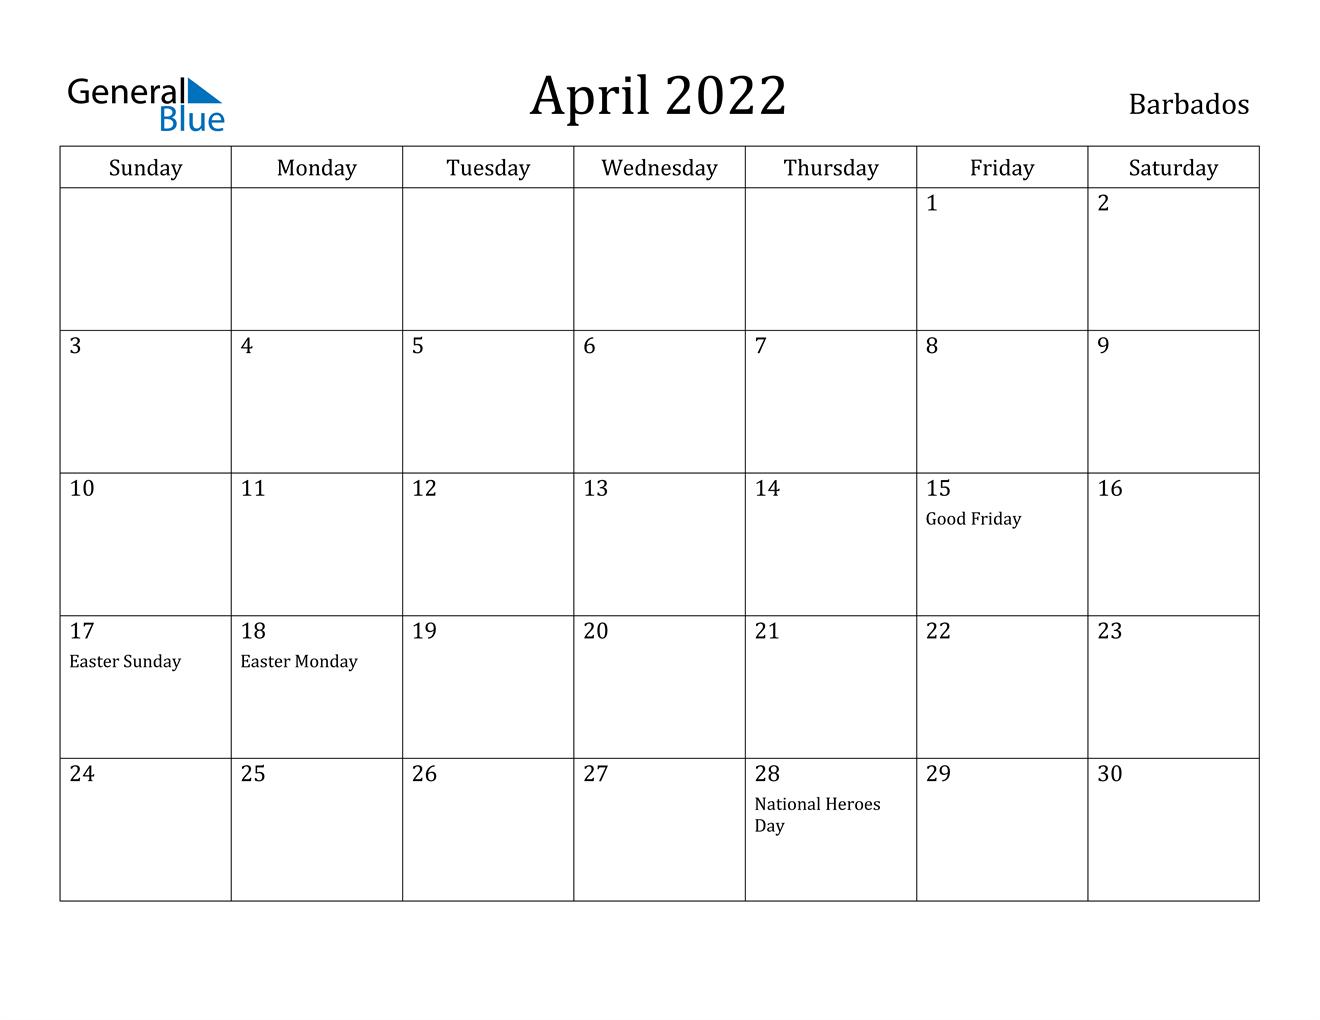 April 2022 Calendar – Barbados Throughout January February March April May Calendar 2022